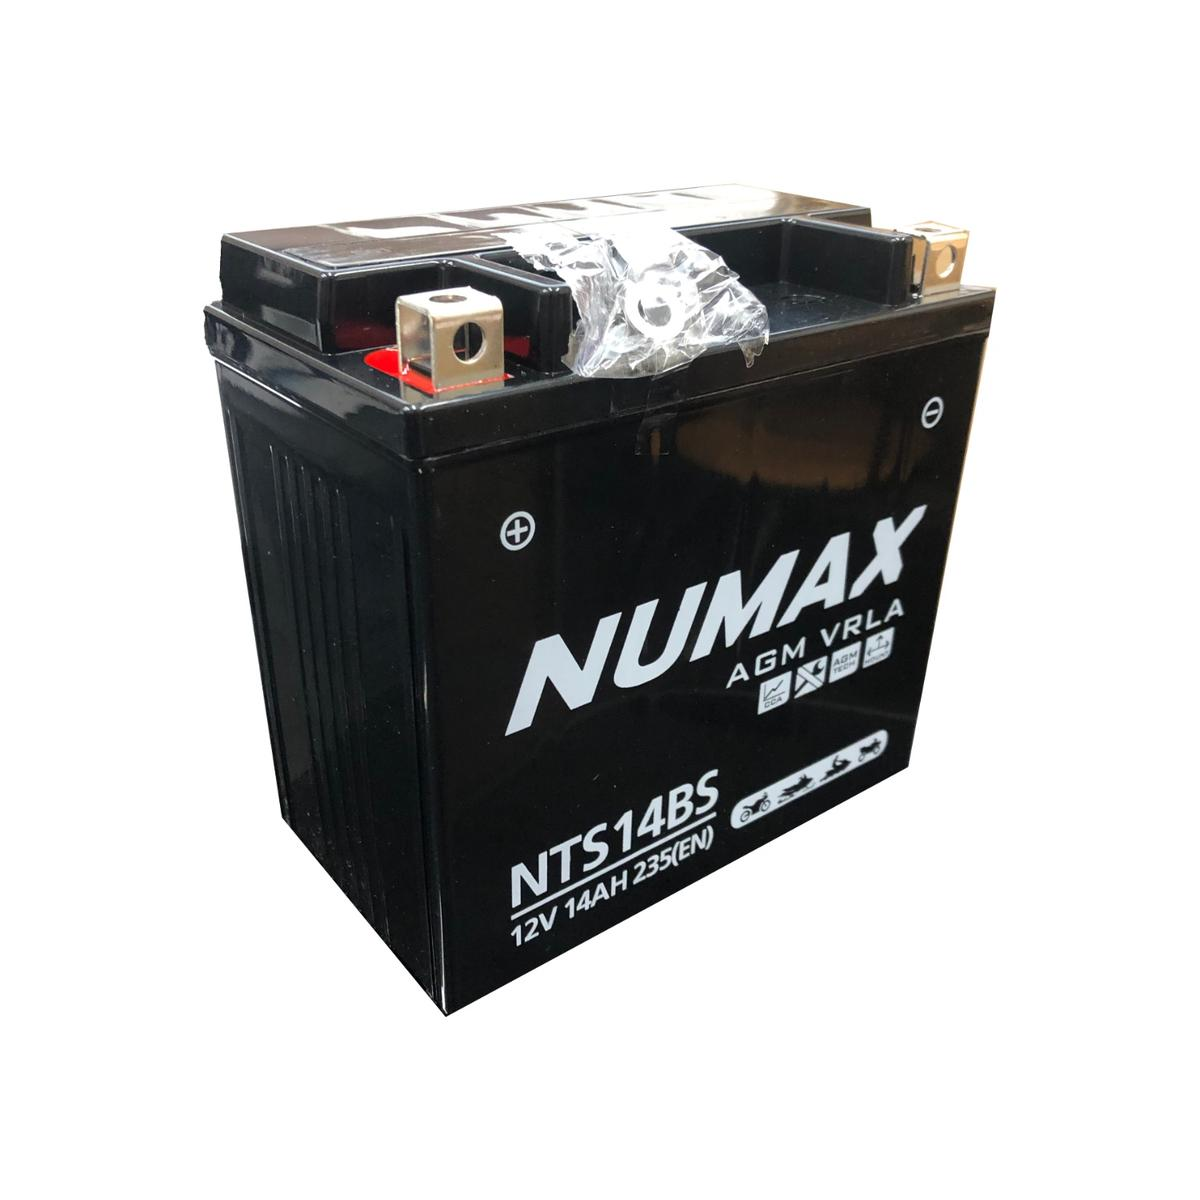 Numax NTS14BS 12v Motorbike Battery BMW 1200cc K1200s YTX14-4